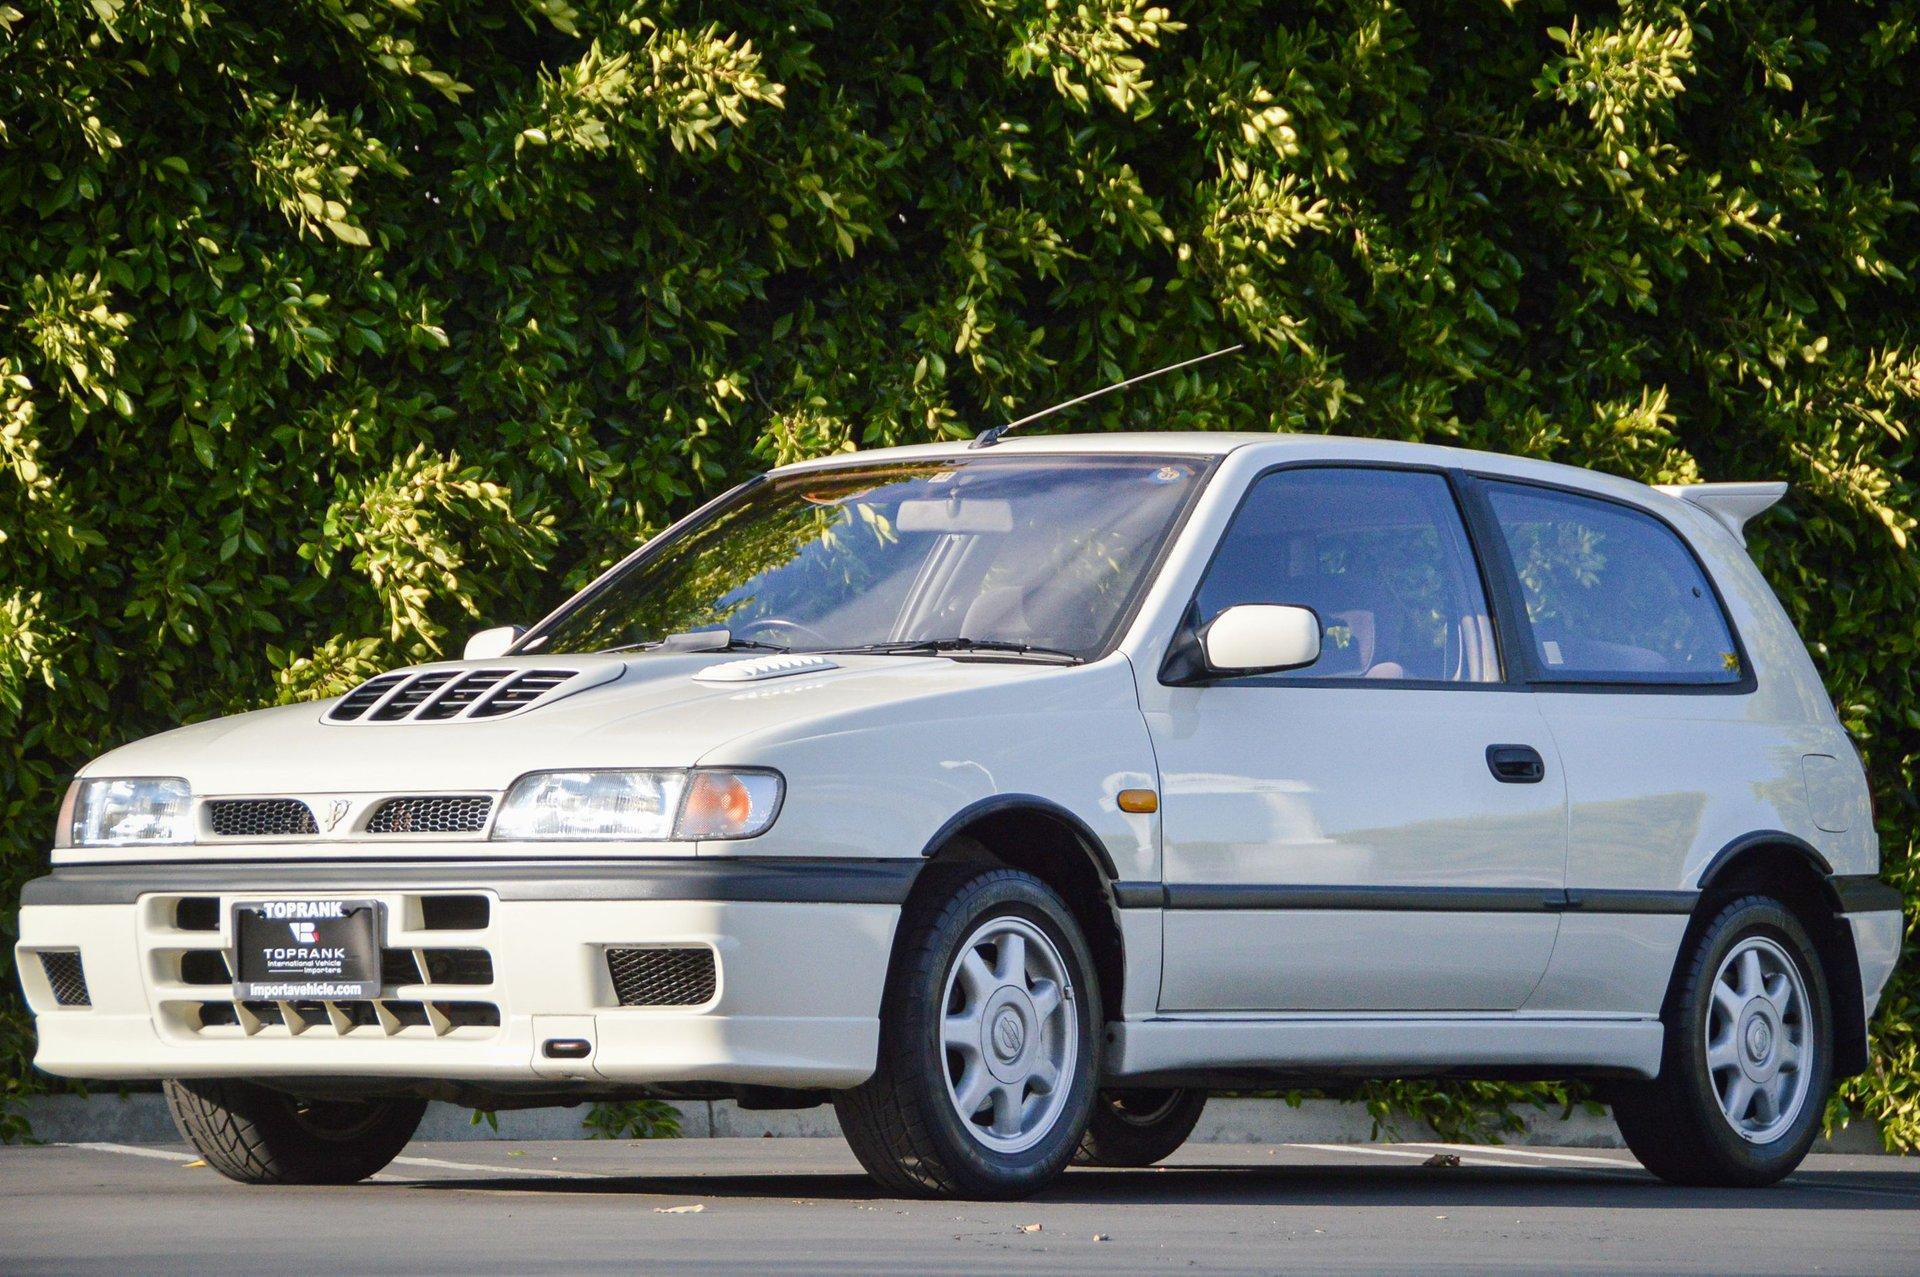 1991 Nissan Pulsar